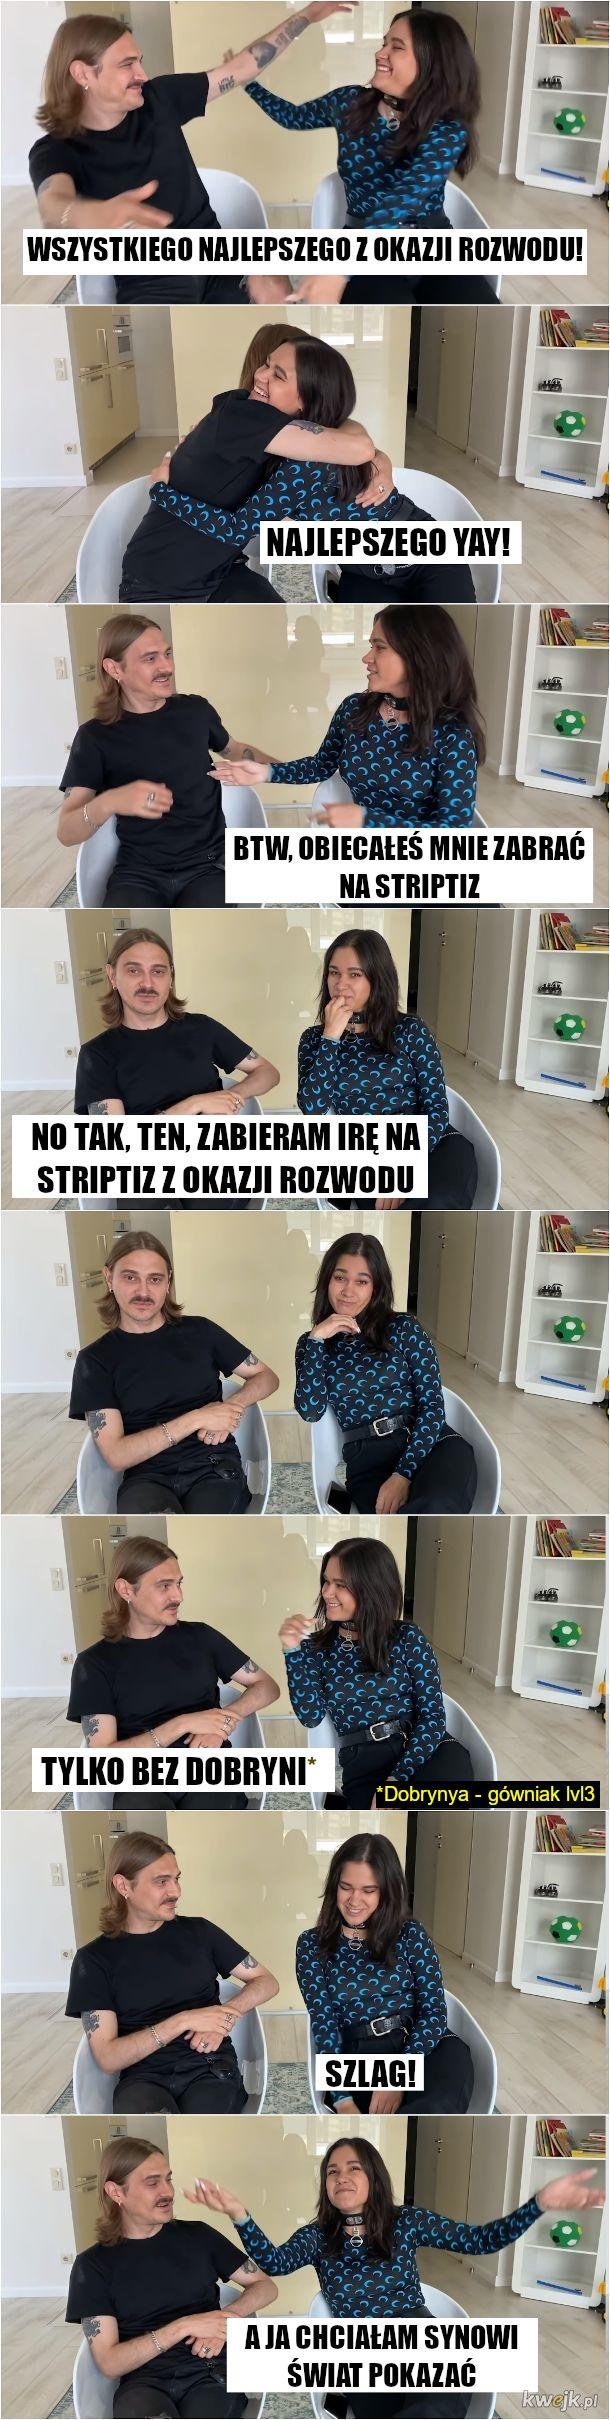 Ilicz z littlebig i Tatarka